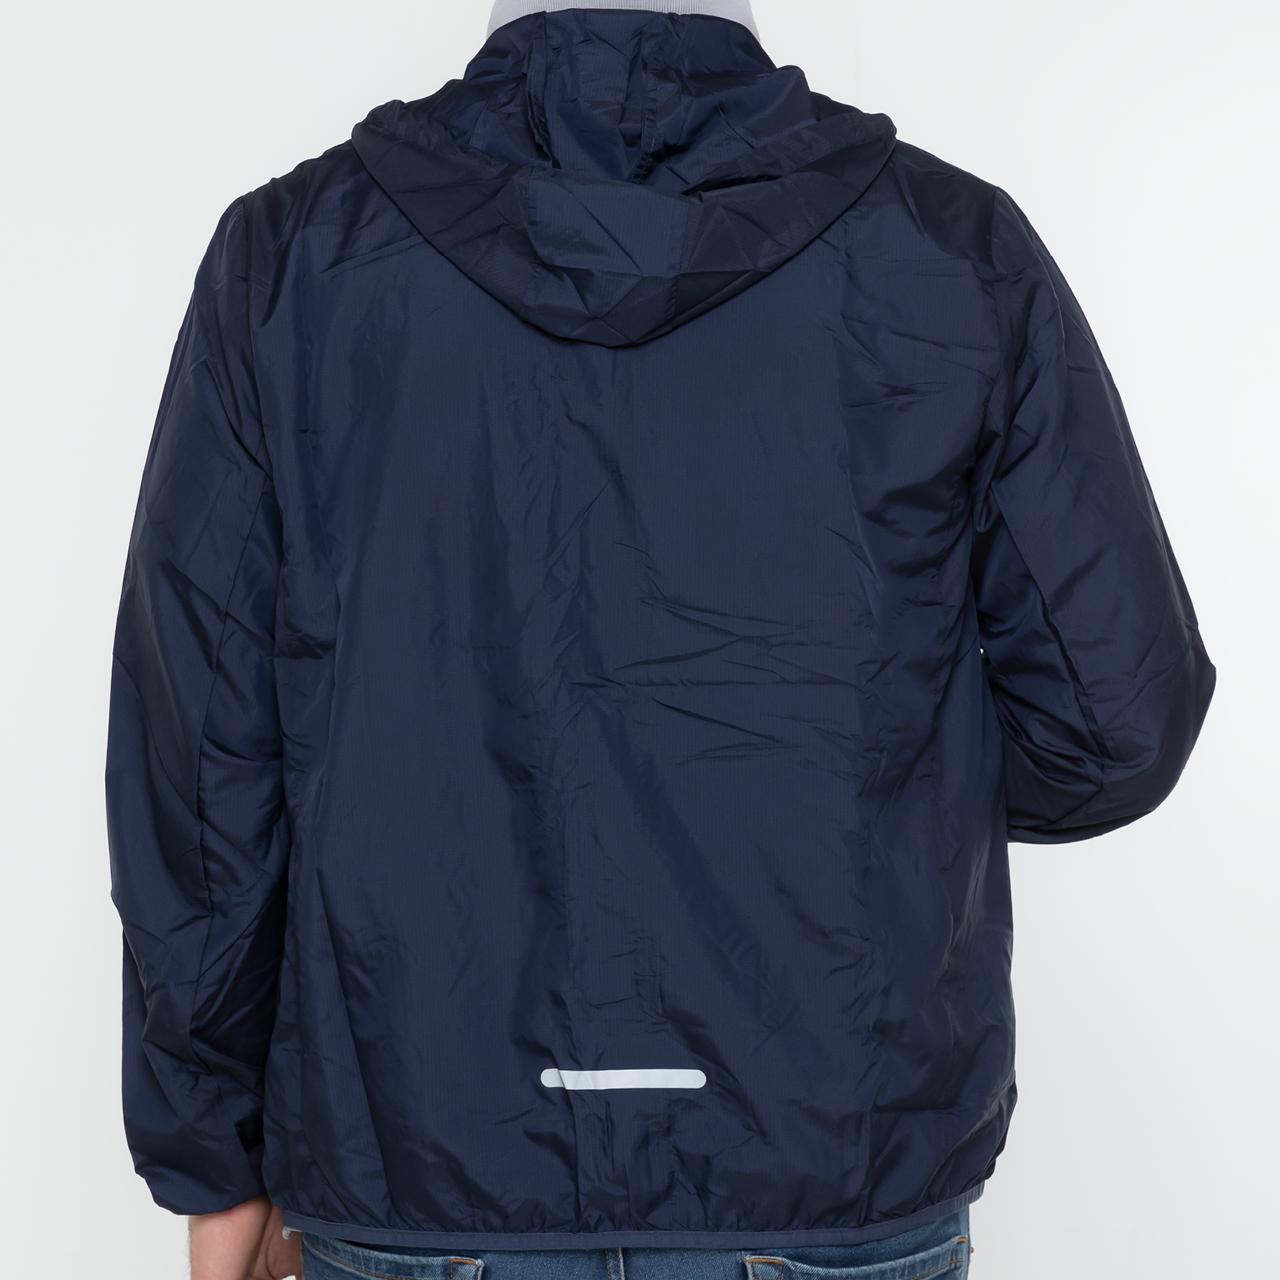 All Season Herren-Jacken in blau